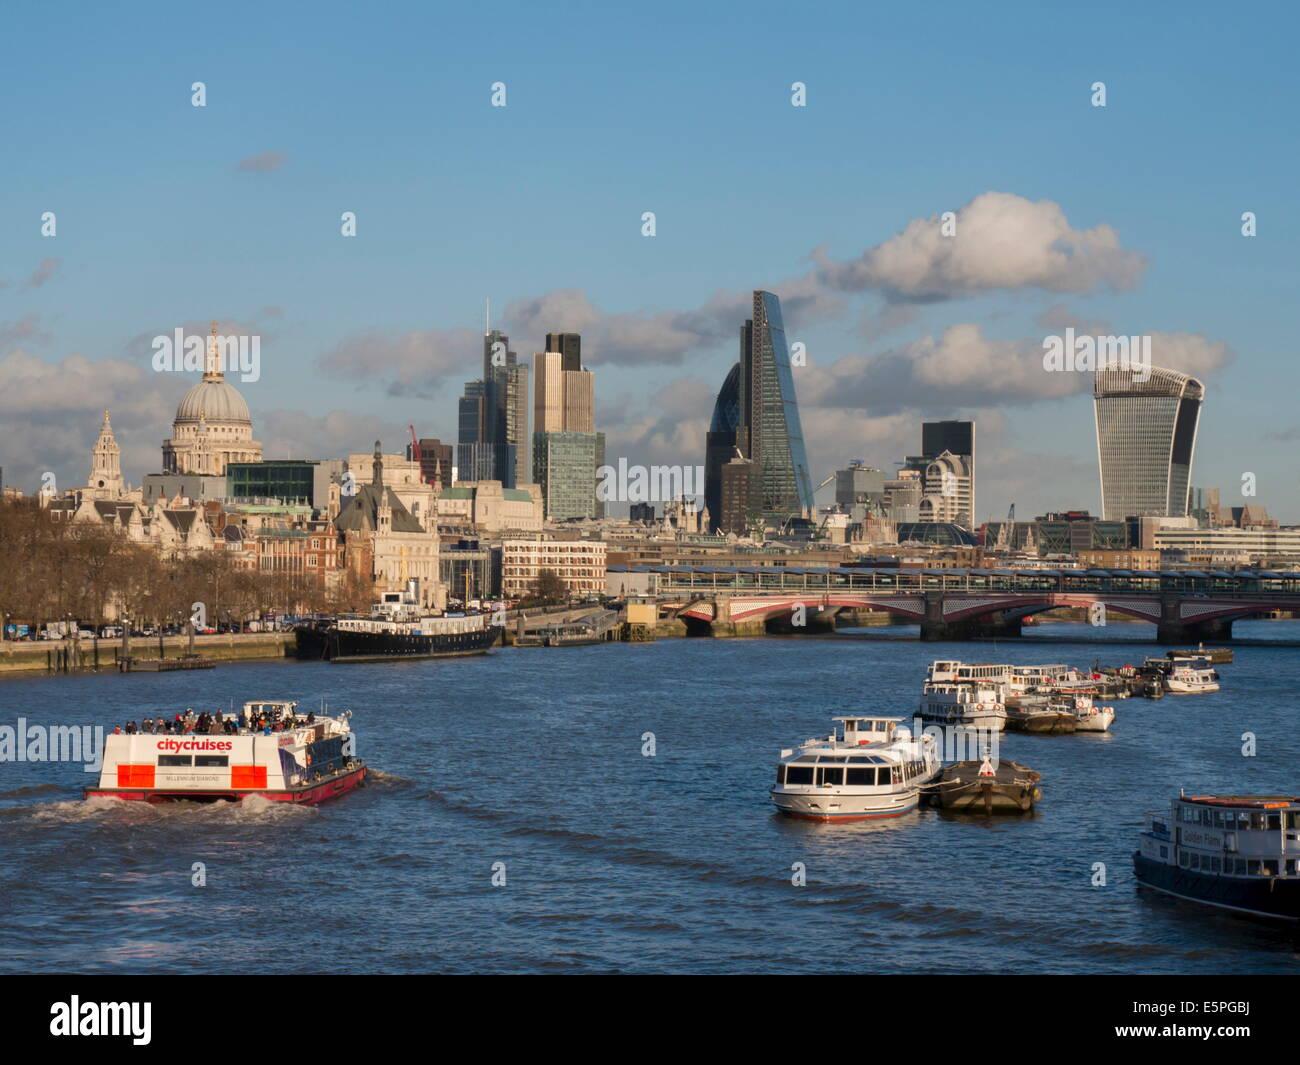 Classic cityscape across Blackfriars Bridge shows City CBD and St. Pauls Cathedral, London, England, United Kingdom, - Stock Image